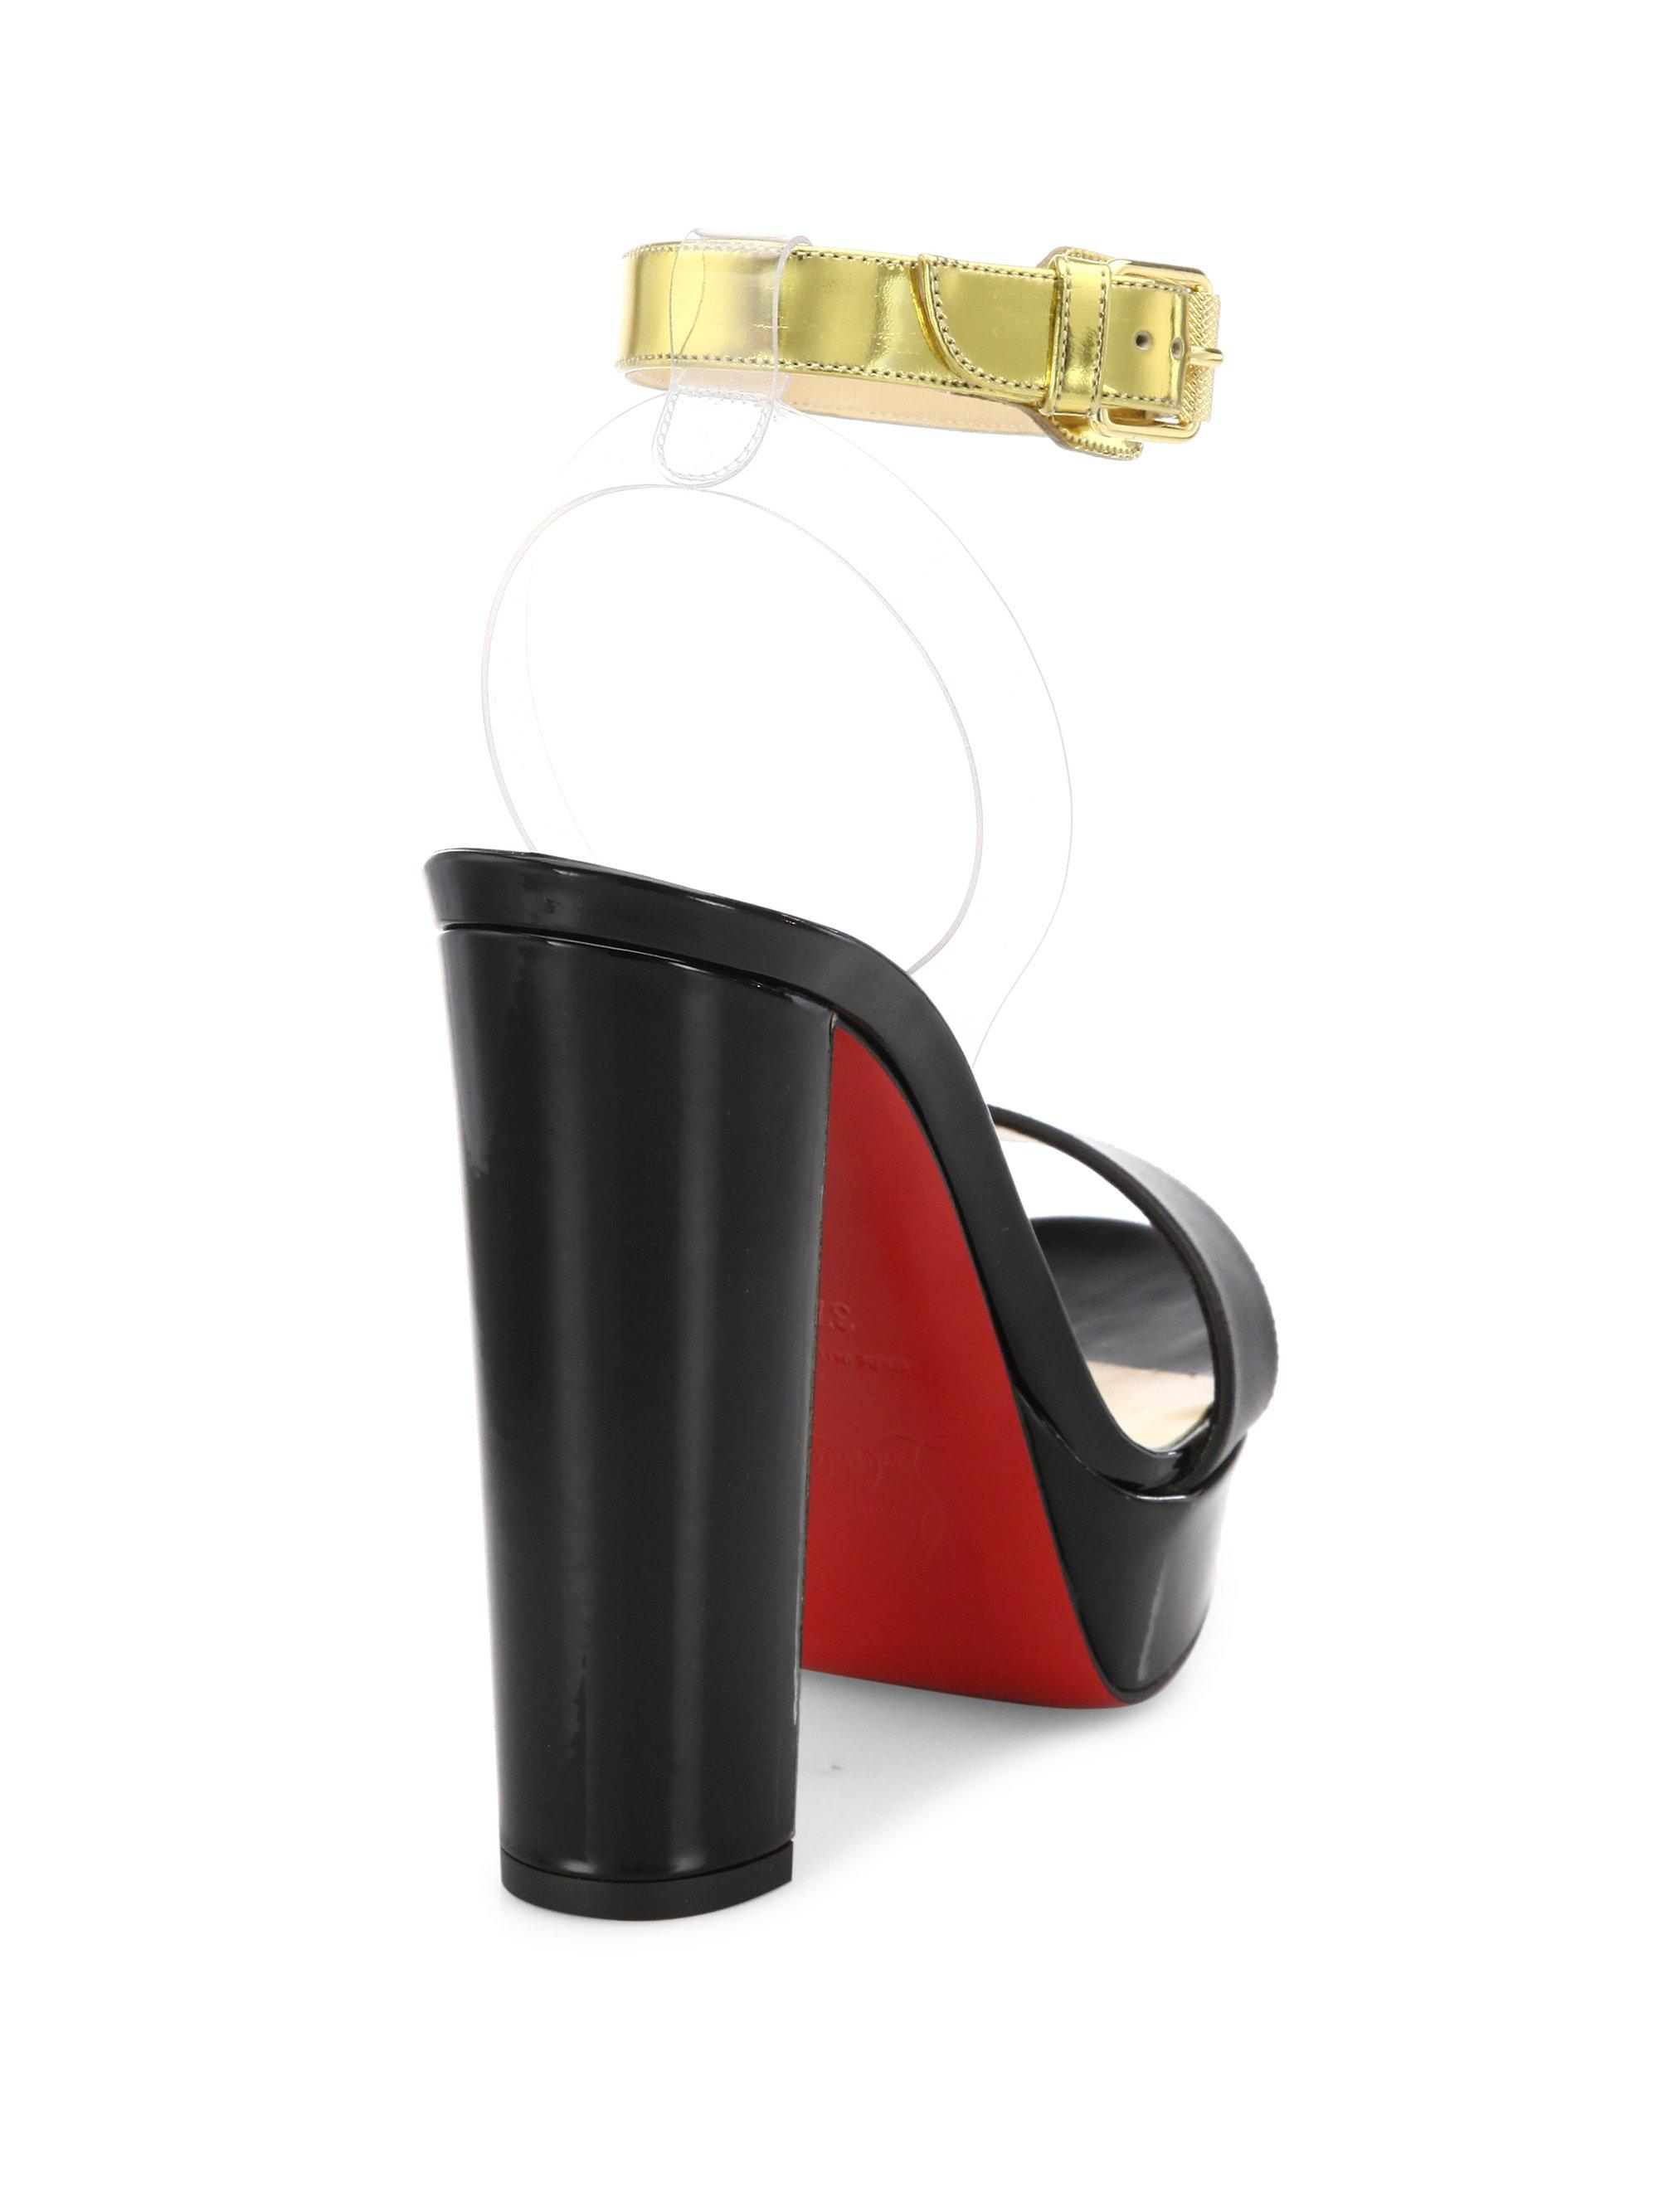 9bb353a64cc4 Lyst - Christian Louboutin Cherry Patent Leather   Pvc Ankle-strap ...